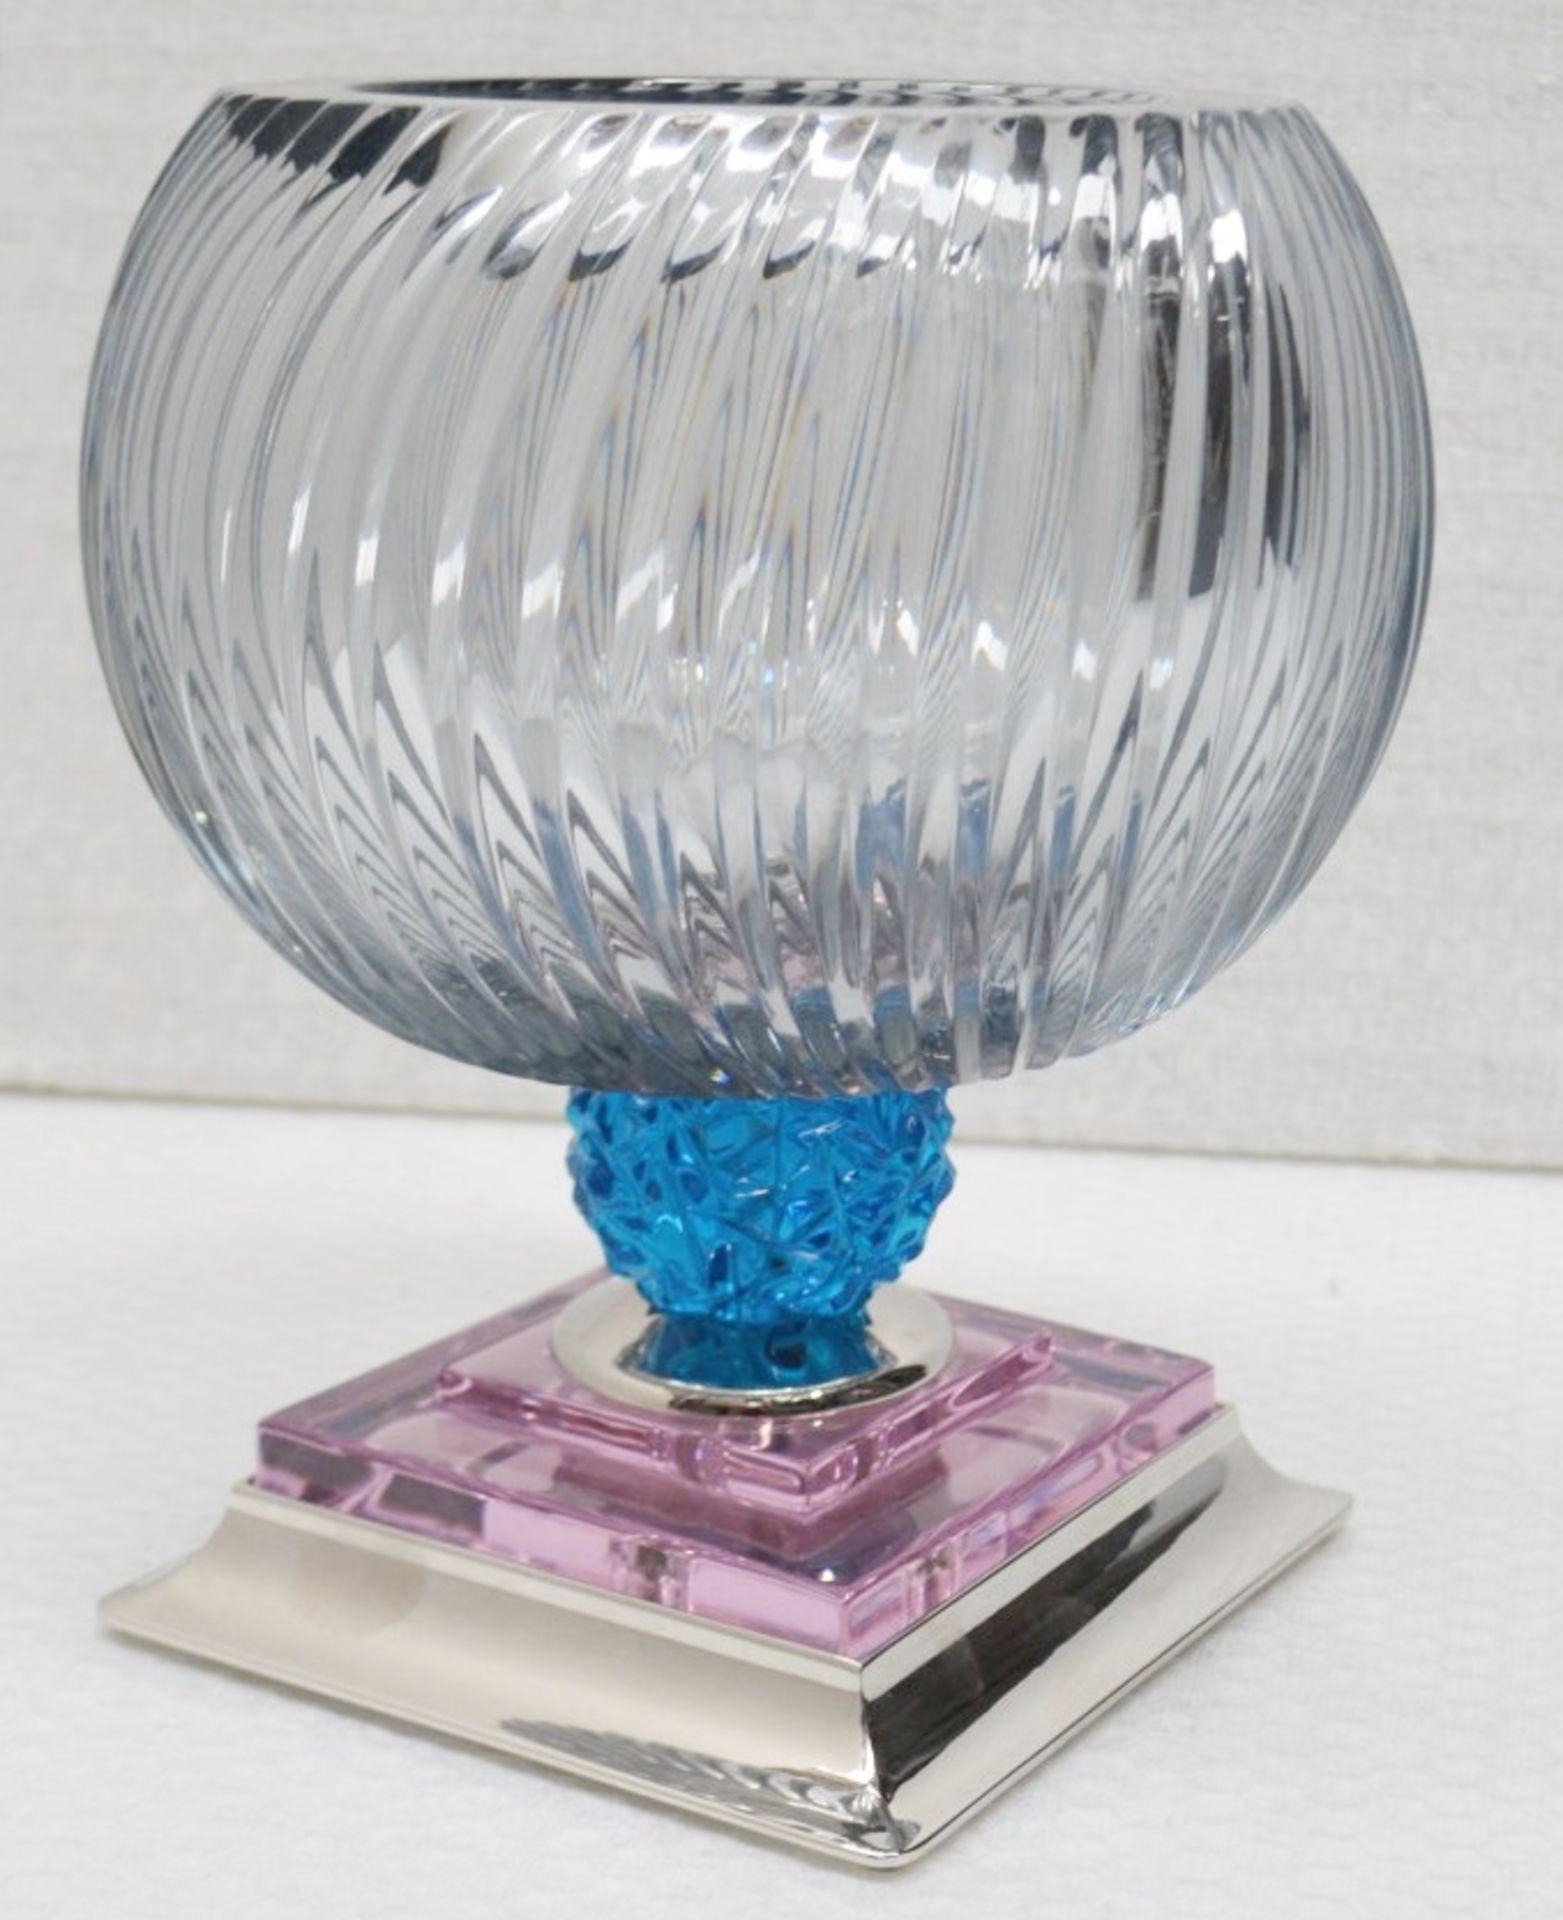 1 x BALDI 'Home Jewels' Italian Hand-crafted Artisan Coccinella 'BIG' Cup, In Smoke, Pink & Blue